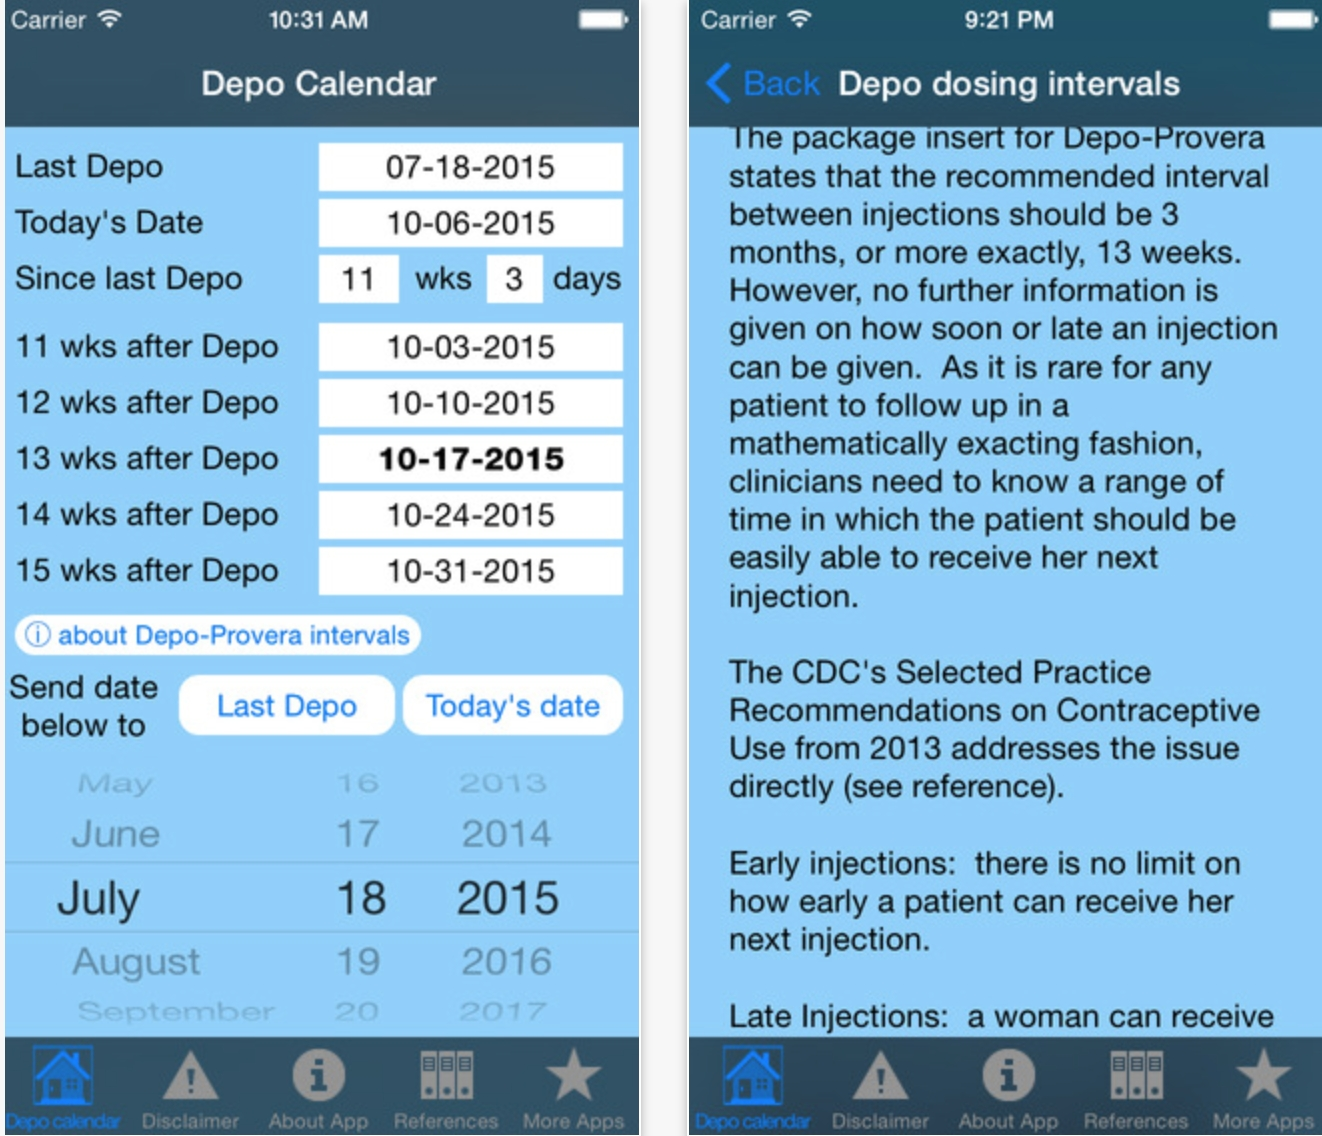 Depo Calendar App Could Significantly Improve Contraception  Depo Provera Due Date Calculator